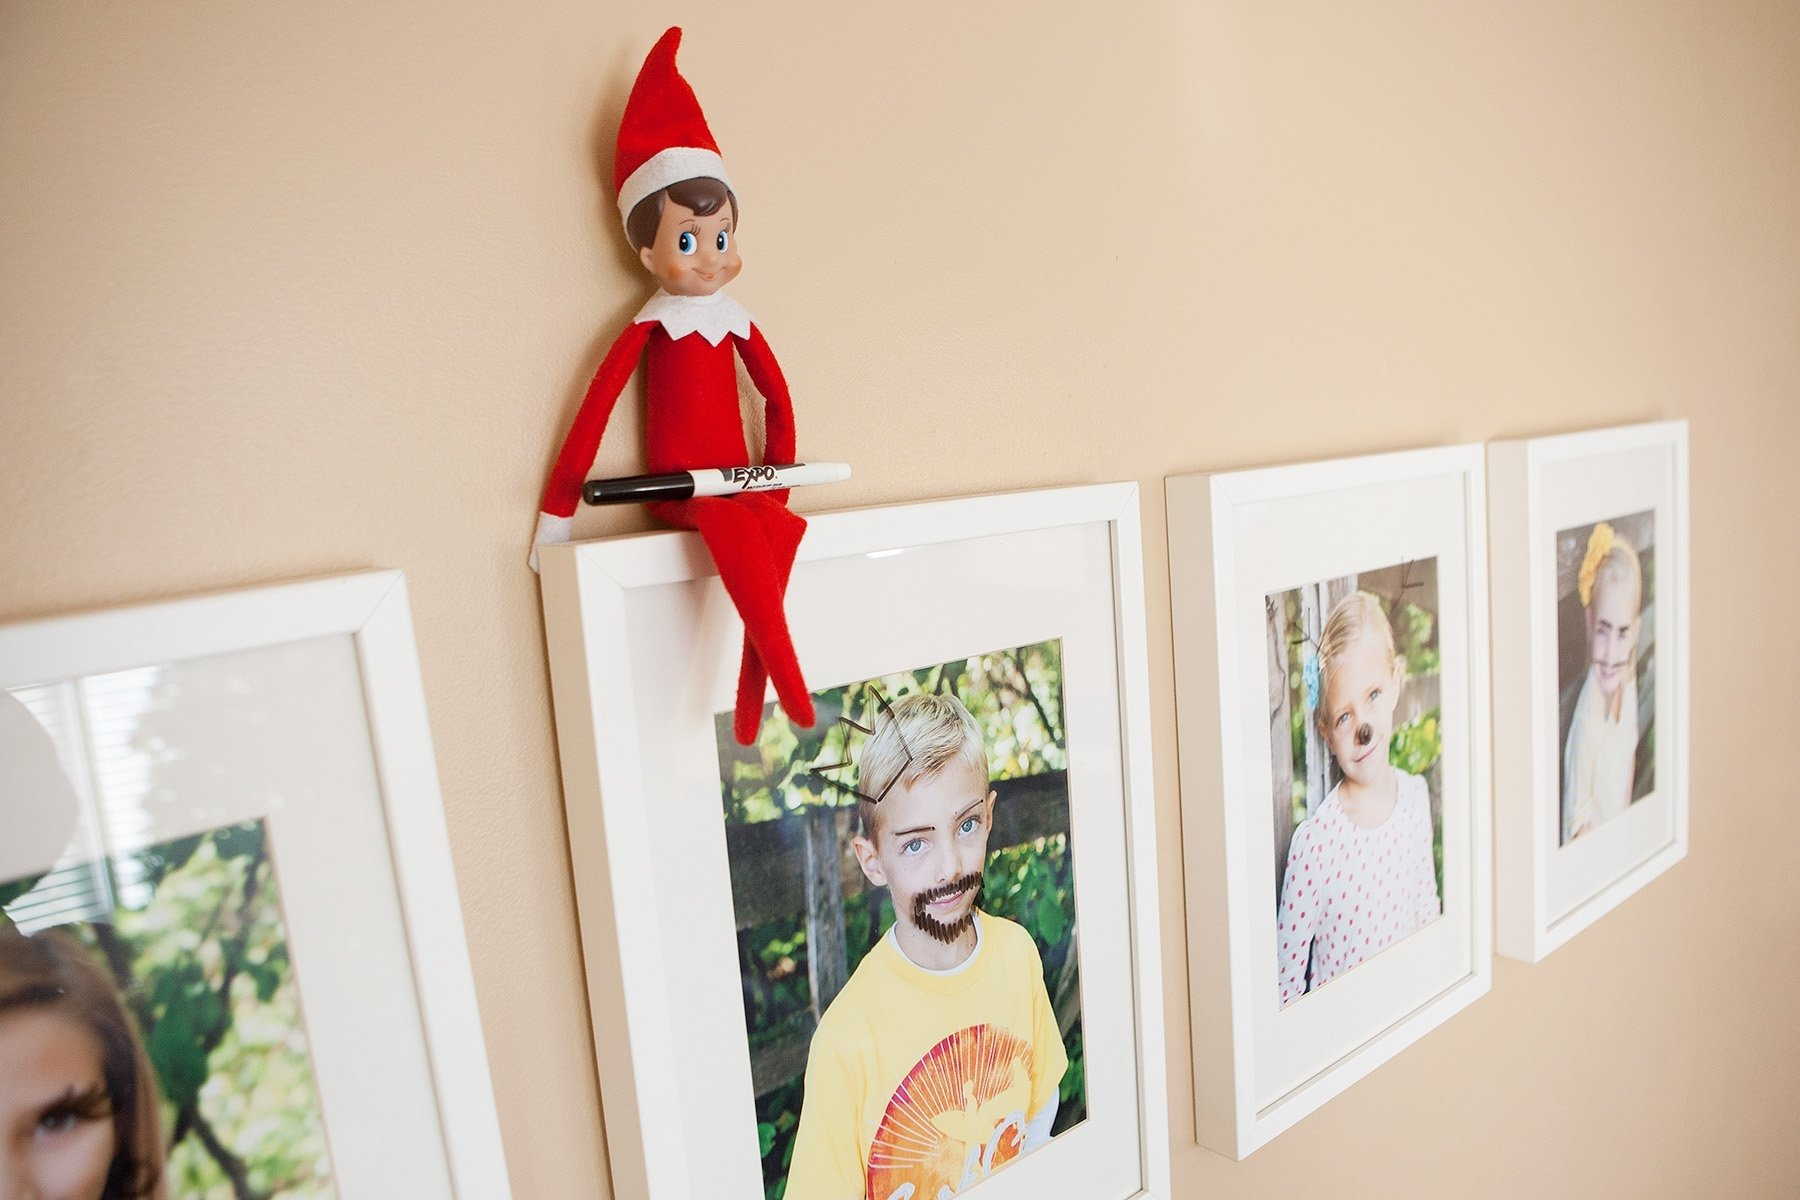 10 Unique Elf On The Self Ideas than 40 easy elf on the shelf ideas 3